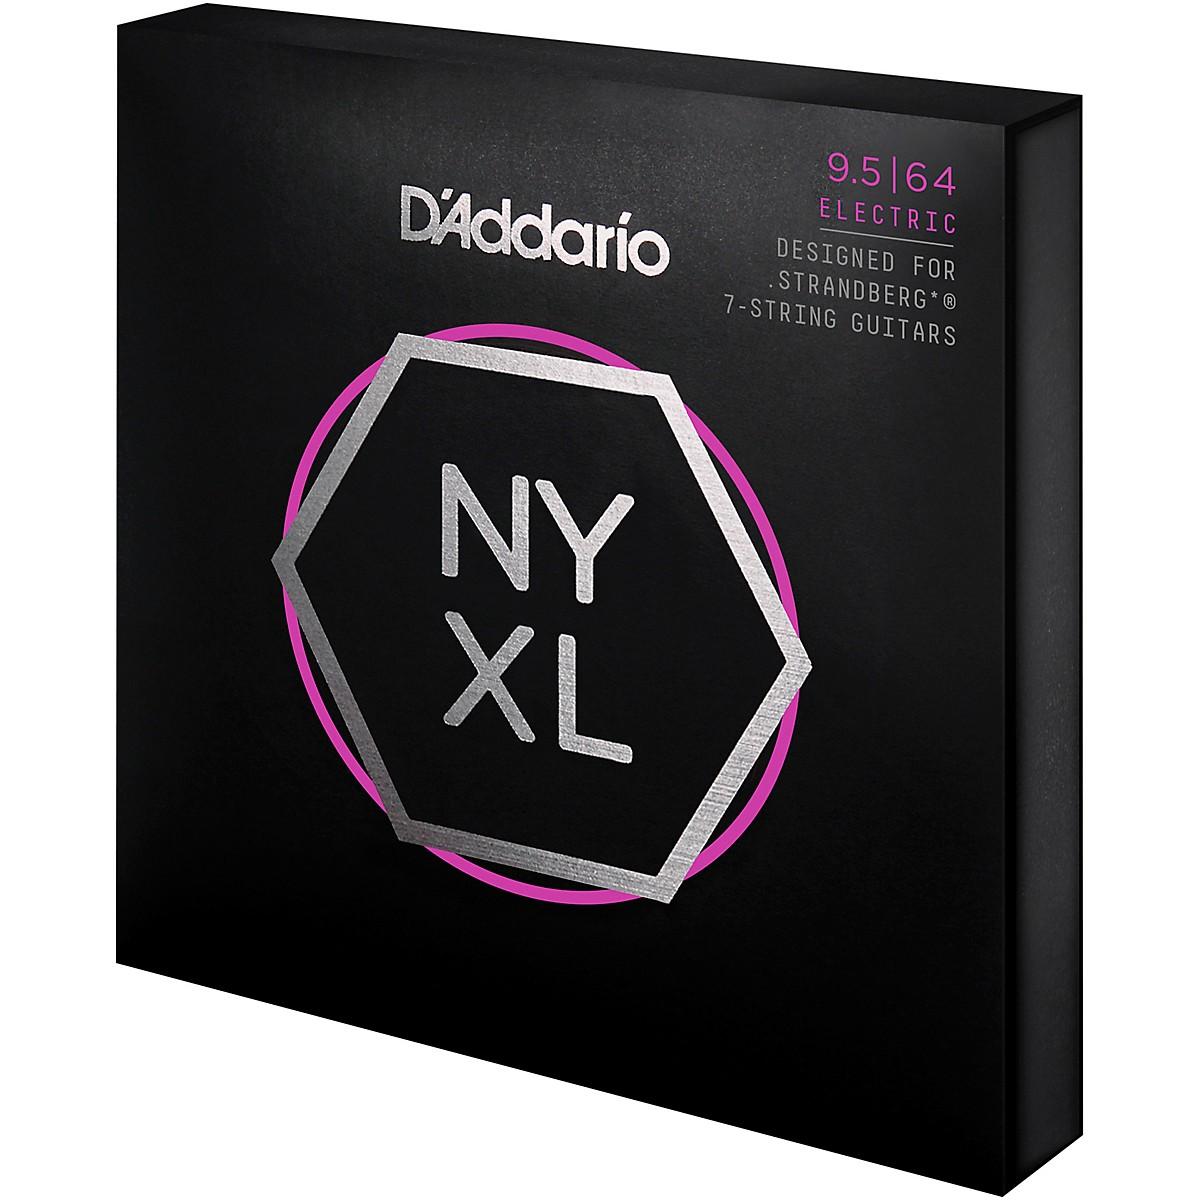 D'Addario NYXL Strandberg 7-String Super Light Plus